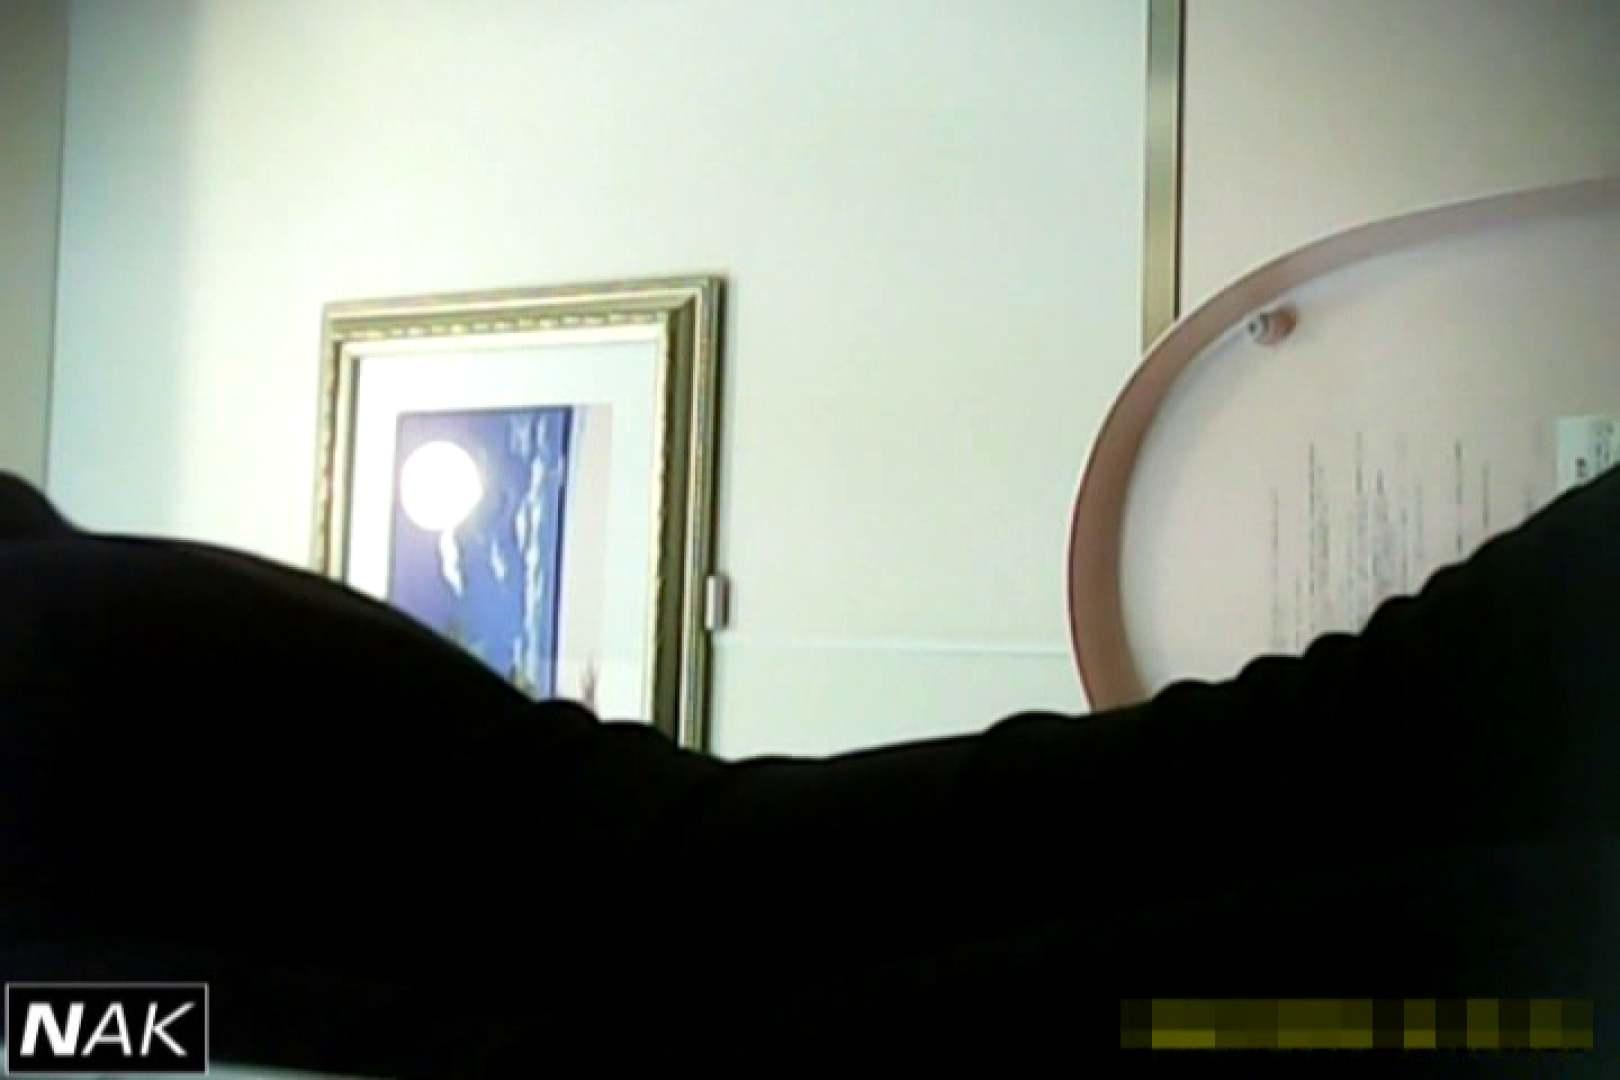 VIP史上初!脅威の3点かわや! vol.08 オマンコ特集 盗み撮り動画 107pic 45